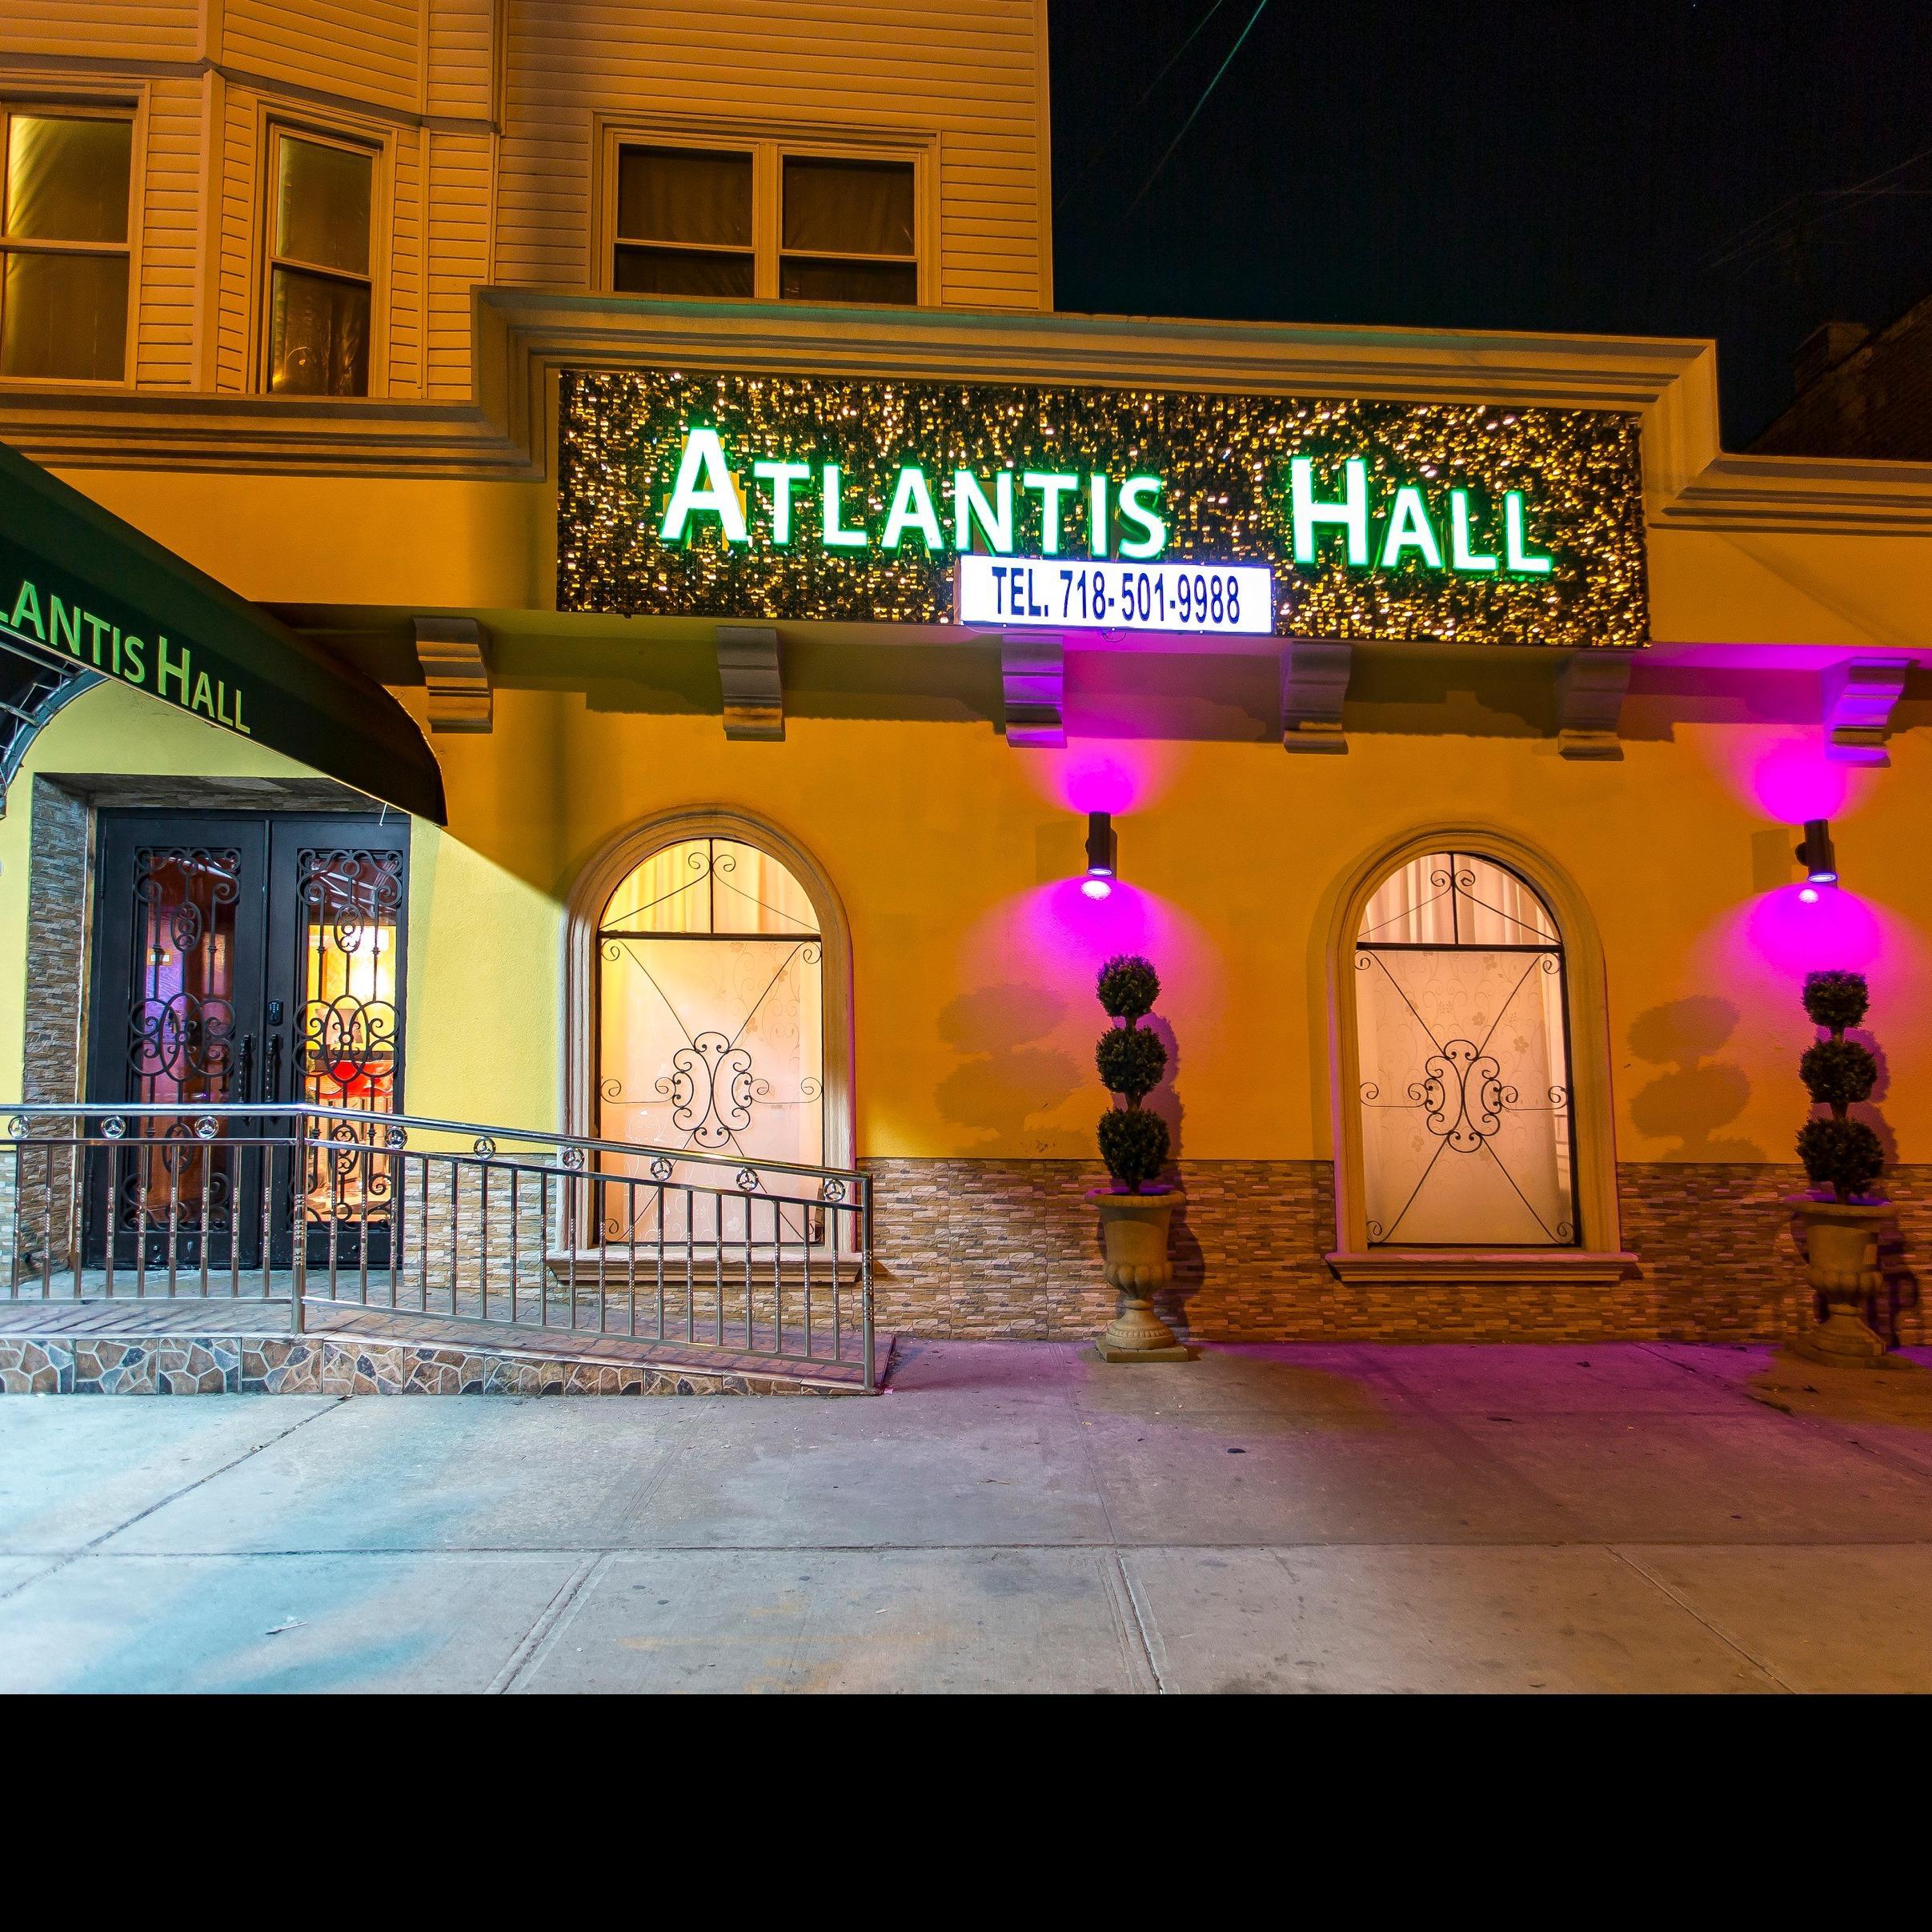 Atlantis Hall